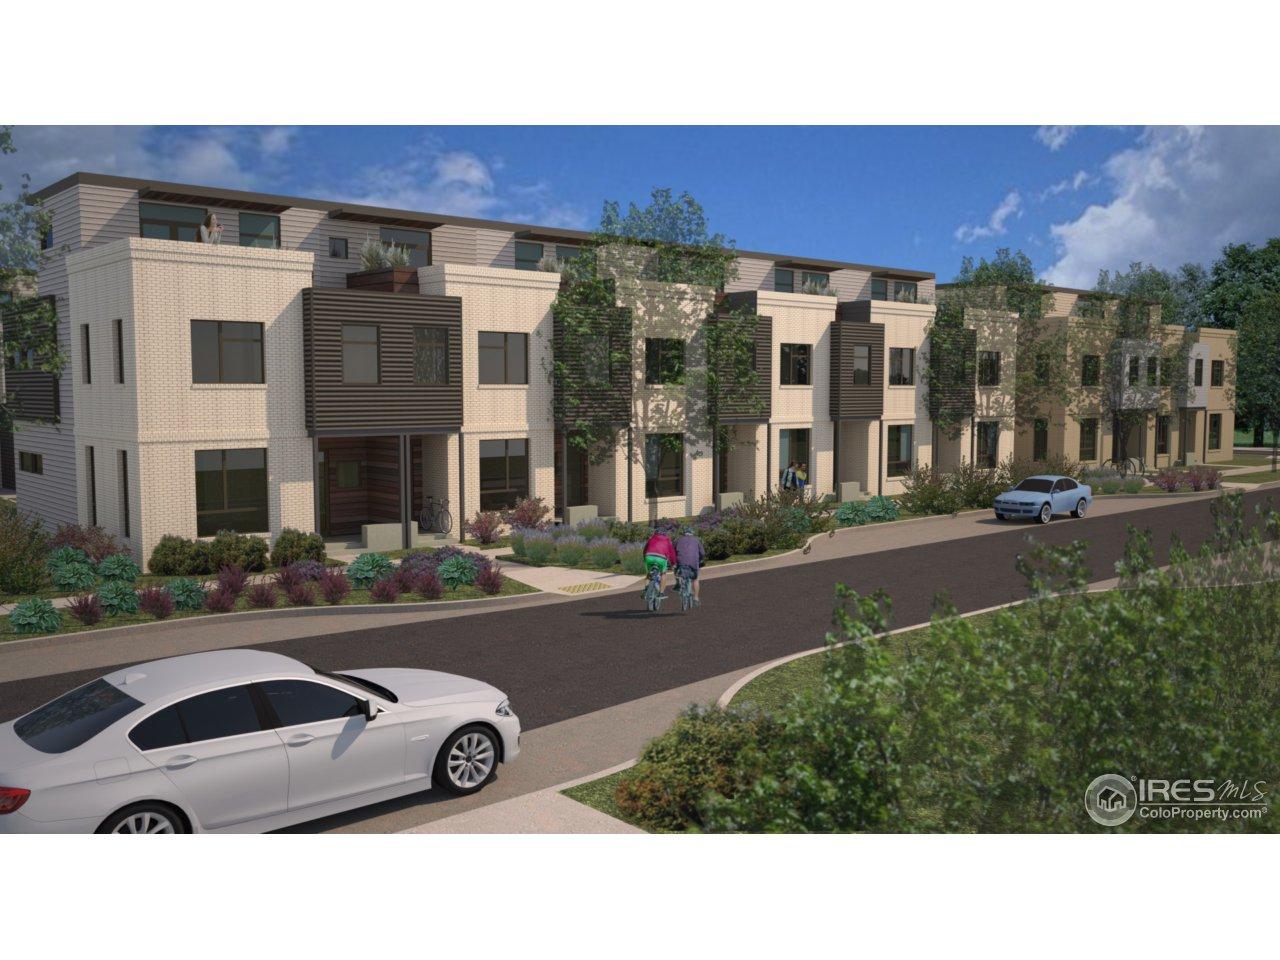 3127 Bluff St, Boulder CO 80301